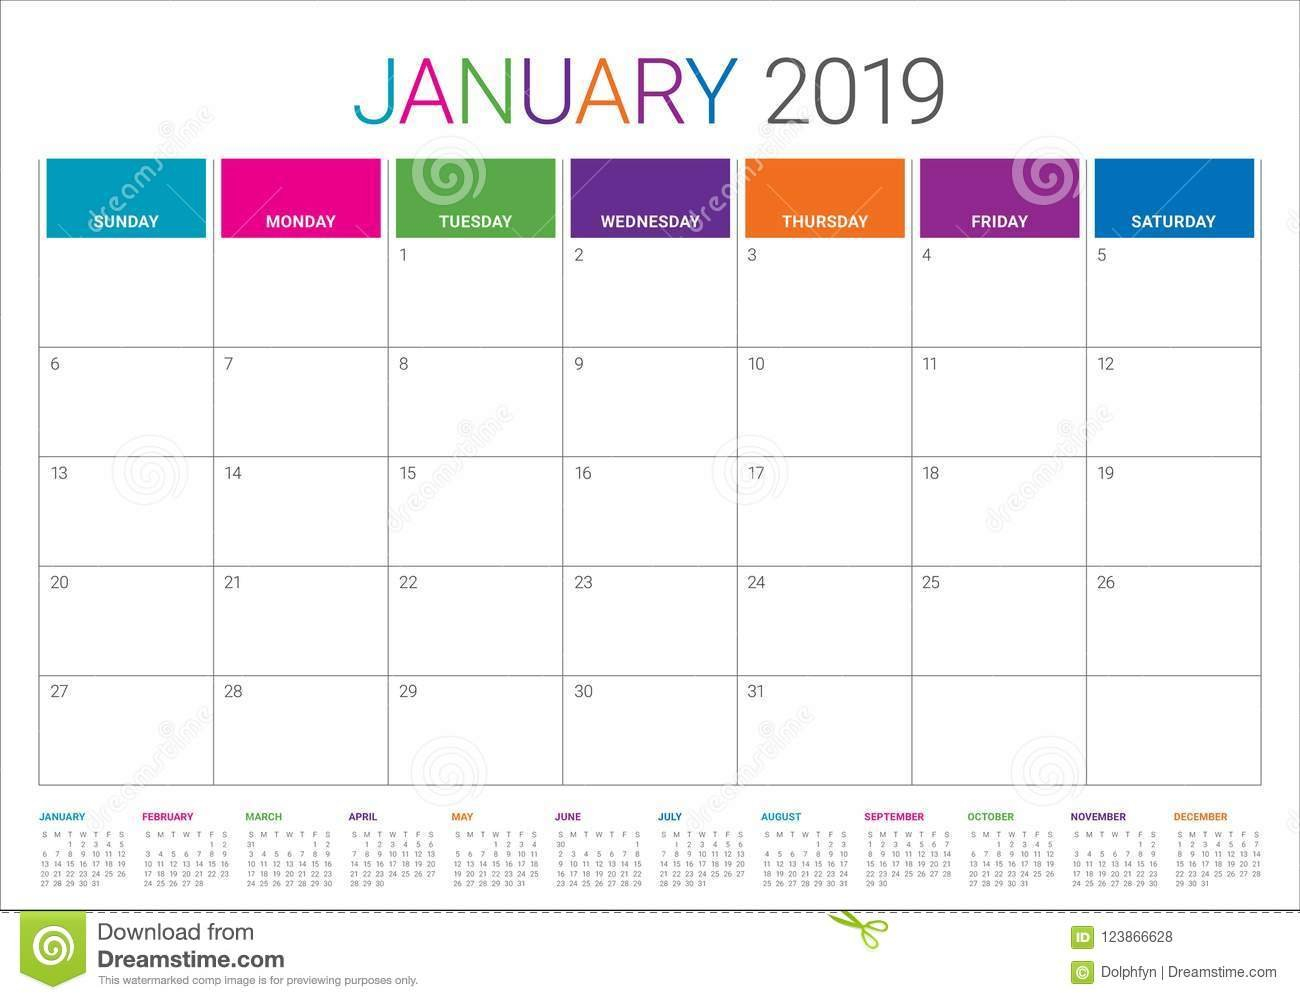 January 2019 Desk Calendar Vector Illustration Stock Vector Calendar 2019 Table